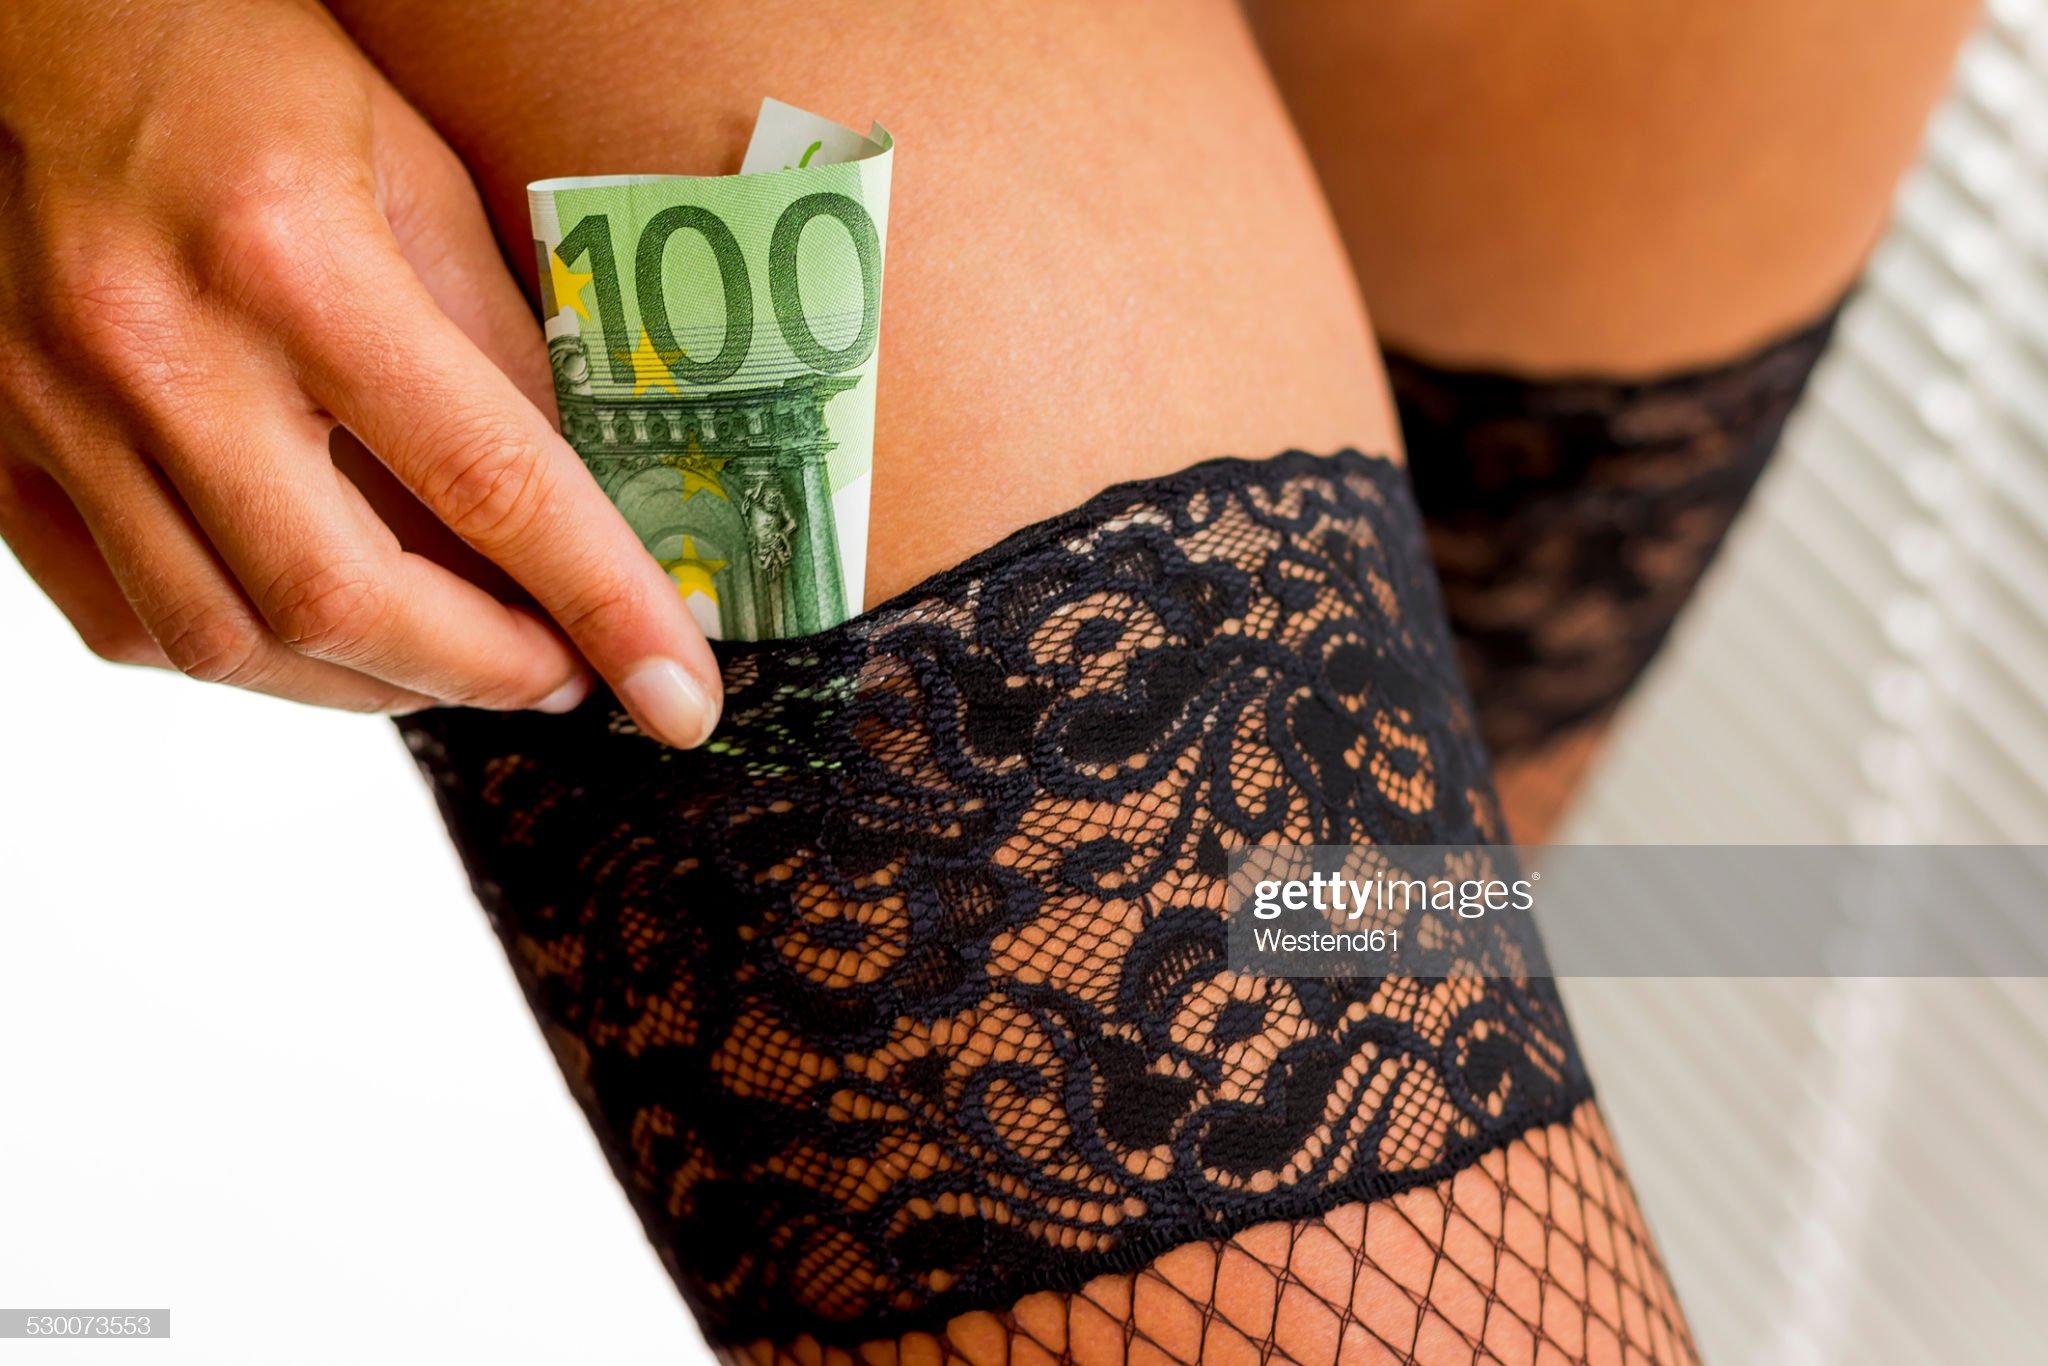 Sad je jasno : Hrvatsko će nebo čuvati netko drugi - Page 3 Young-woman-putting-euro-note-in-her-stocking-picture-id530073553?s=2048x2048